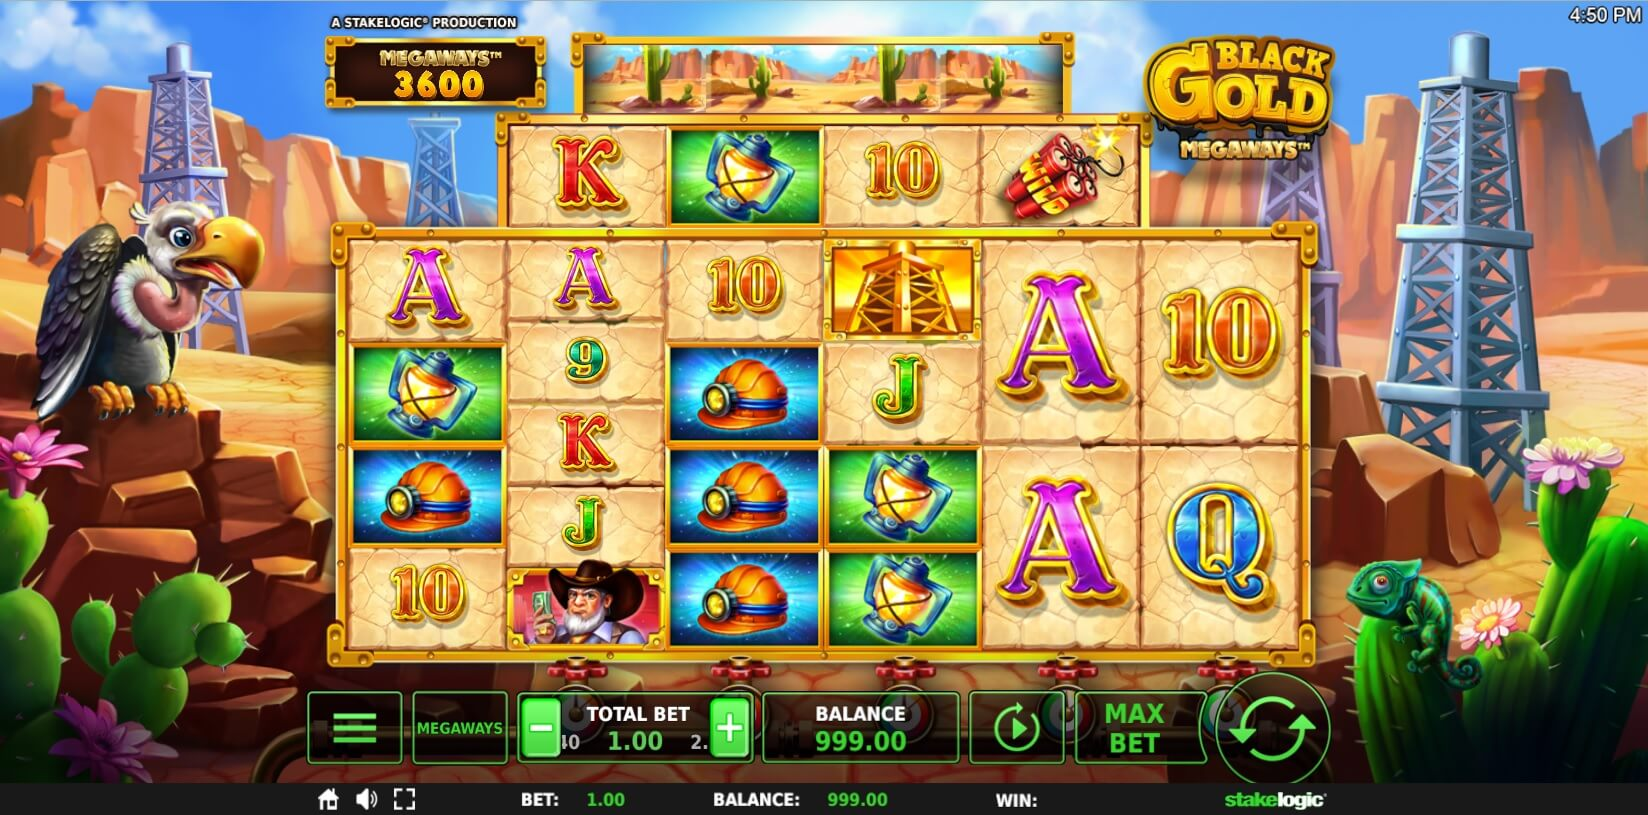 Spiele Black Gold Megaways - Video Slots Online